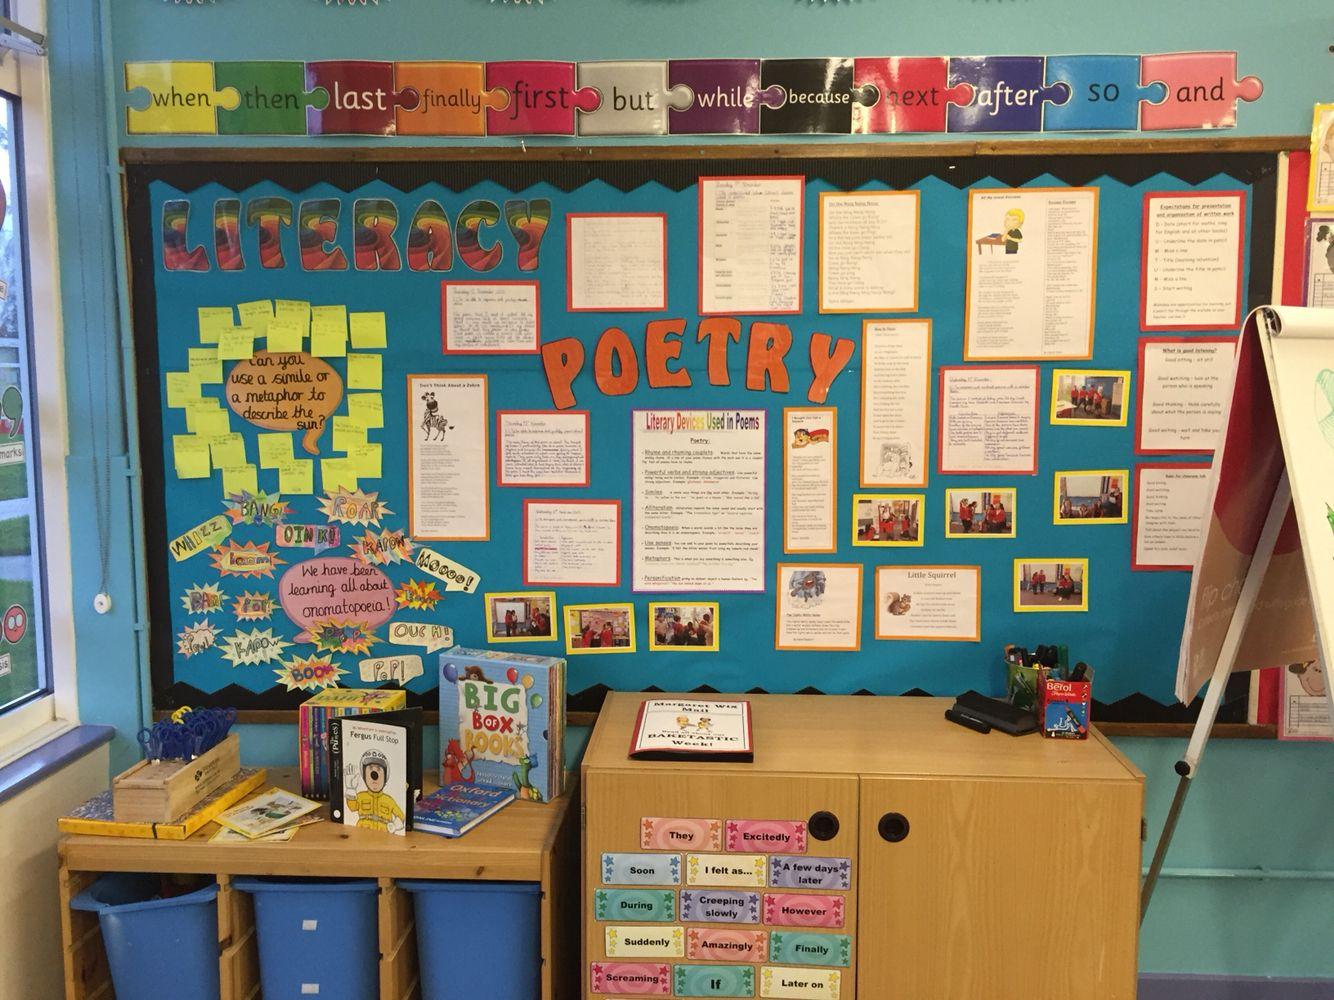 poetry ks2 literacy onomatopoeia 1 a classroom displays literacy y classroom. Black Bedroom Furniture Sets. Home Design Ideas